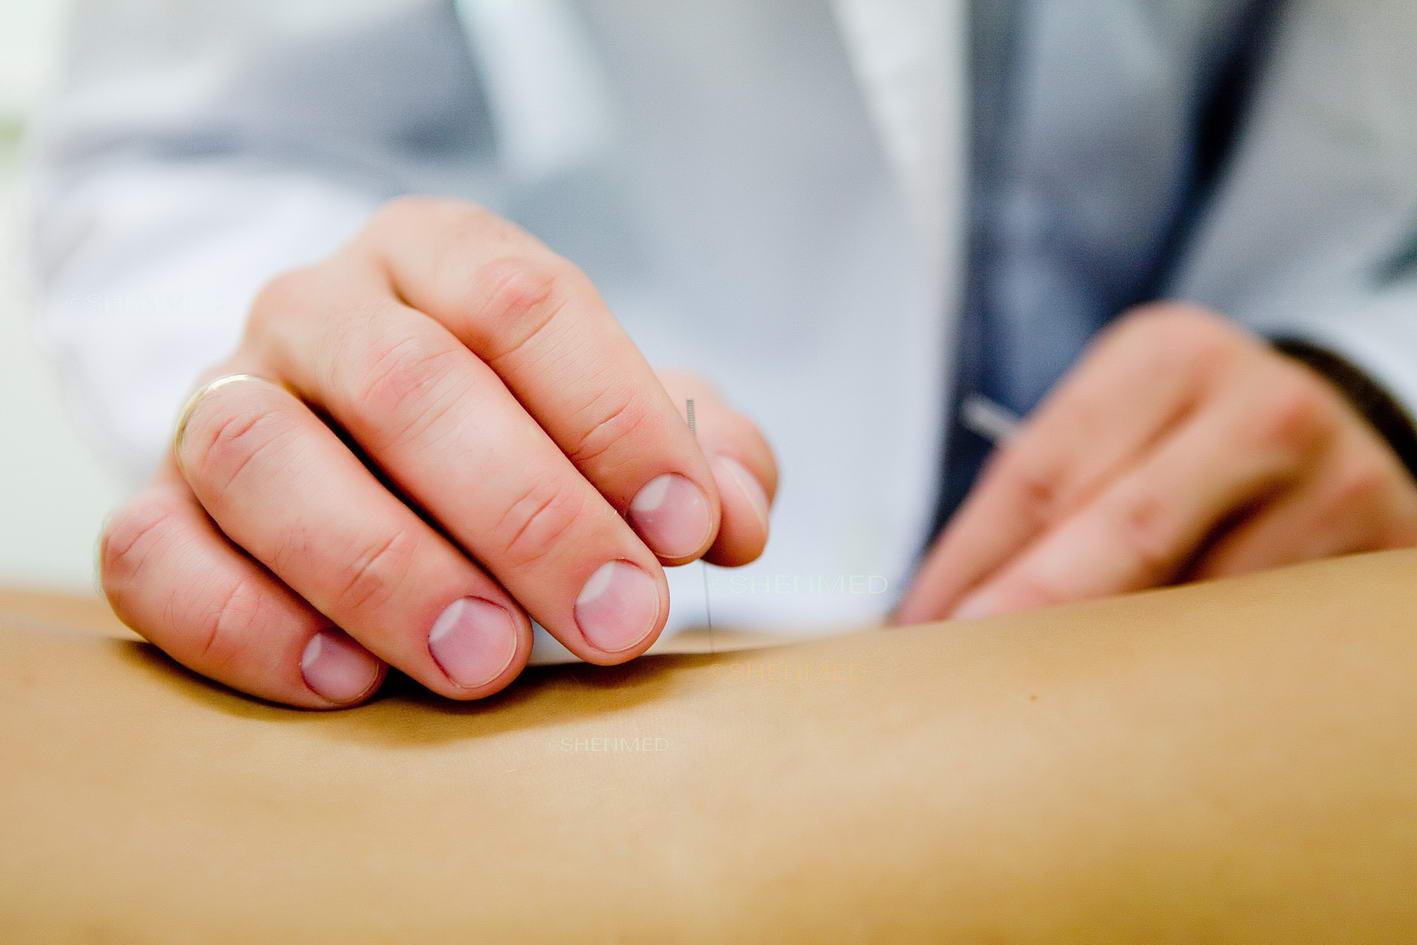 Akupunktura: Co Mówi Tradycyjna Medycyna Chińska